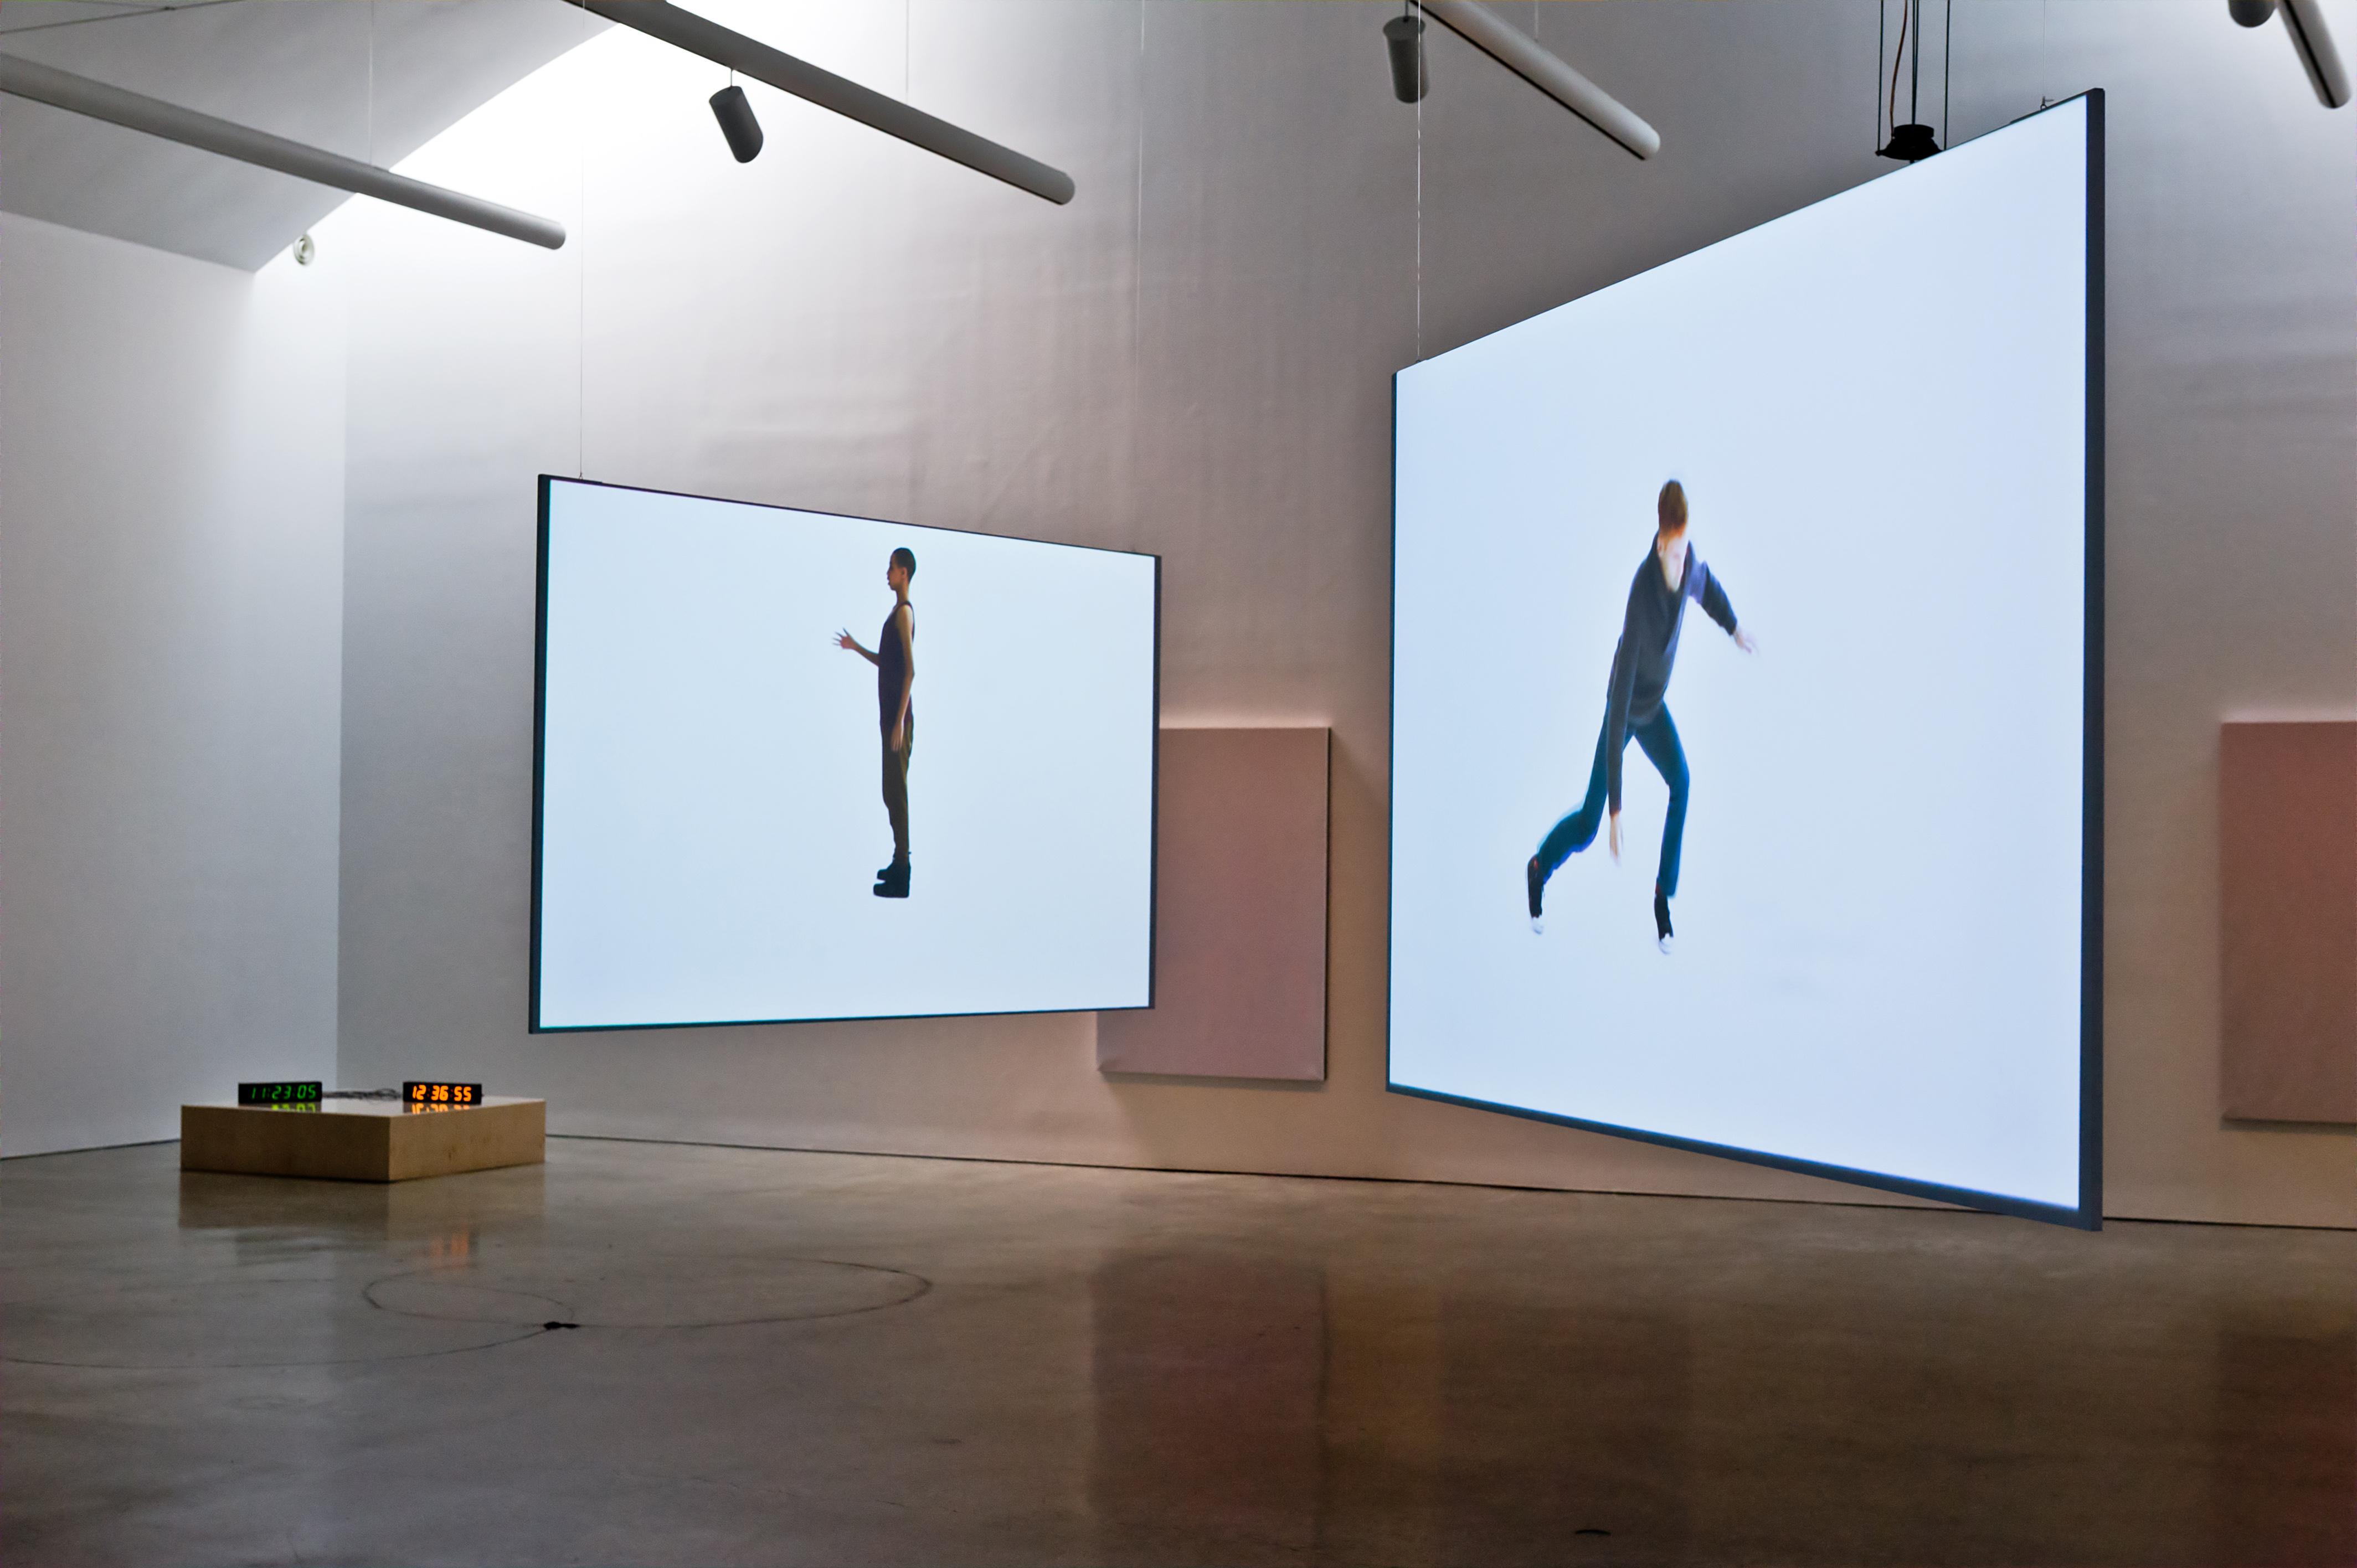 Brennan Gerard & Ryan Kelly, Kiss Solo, 2012. Installation view of Anti-Establishment, CCS Bard Galleries, 2012, Chris Kendall Photographer